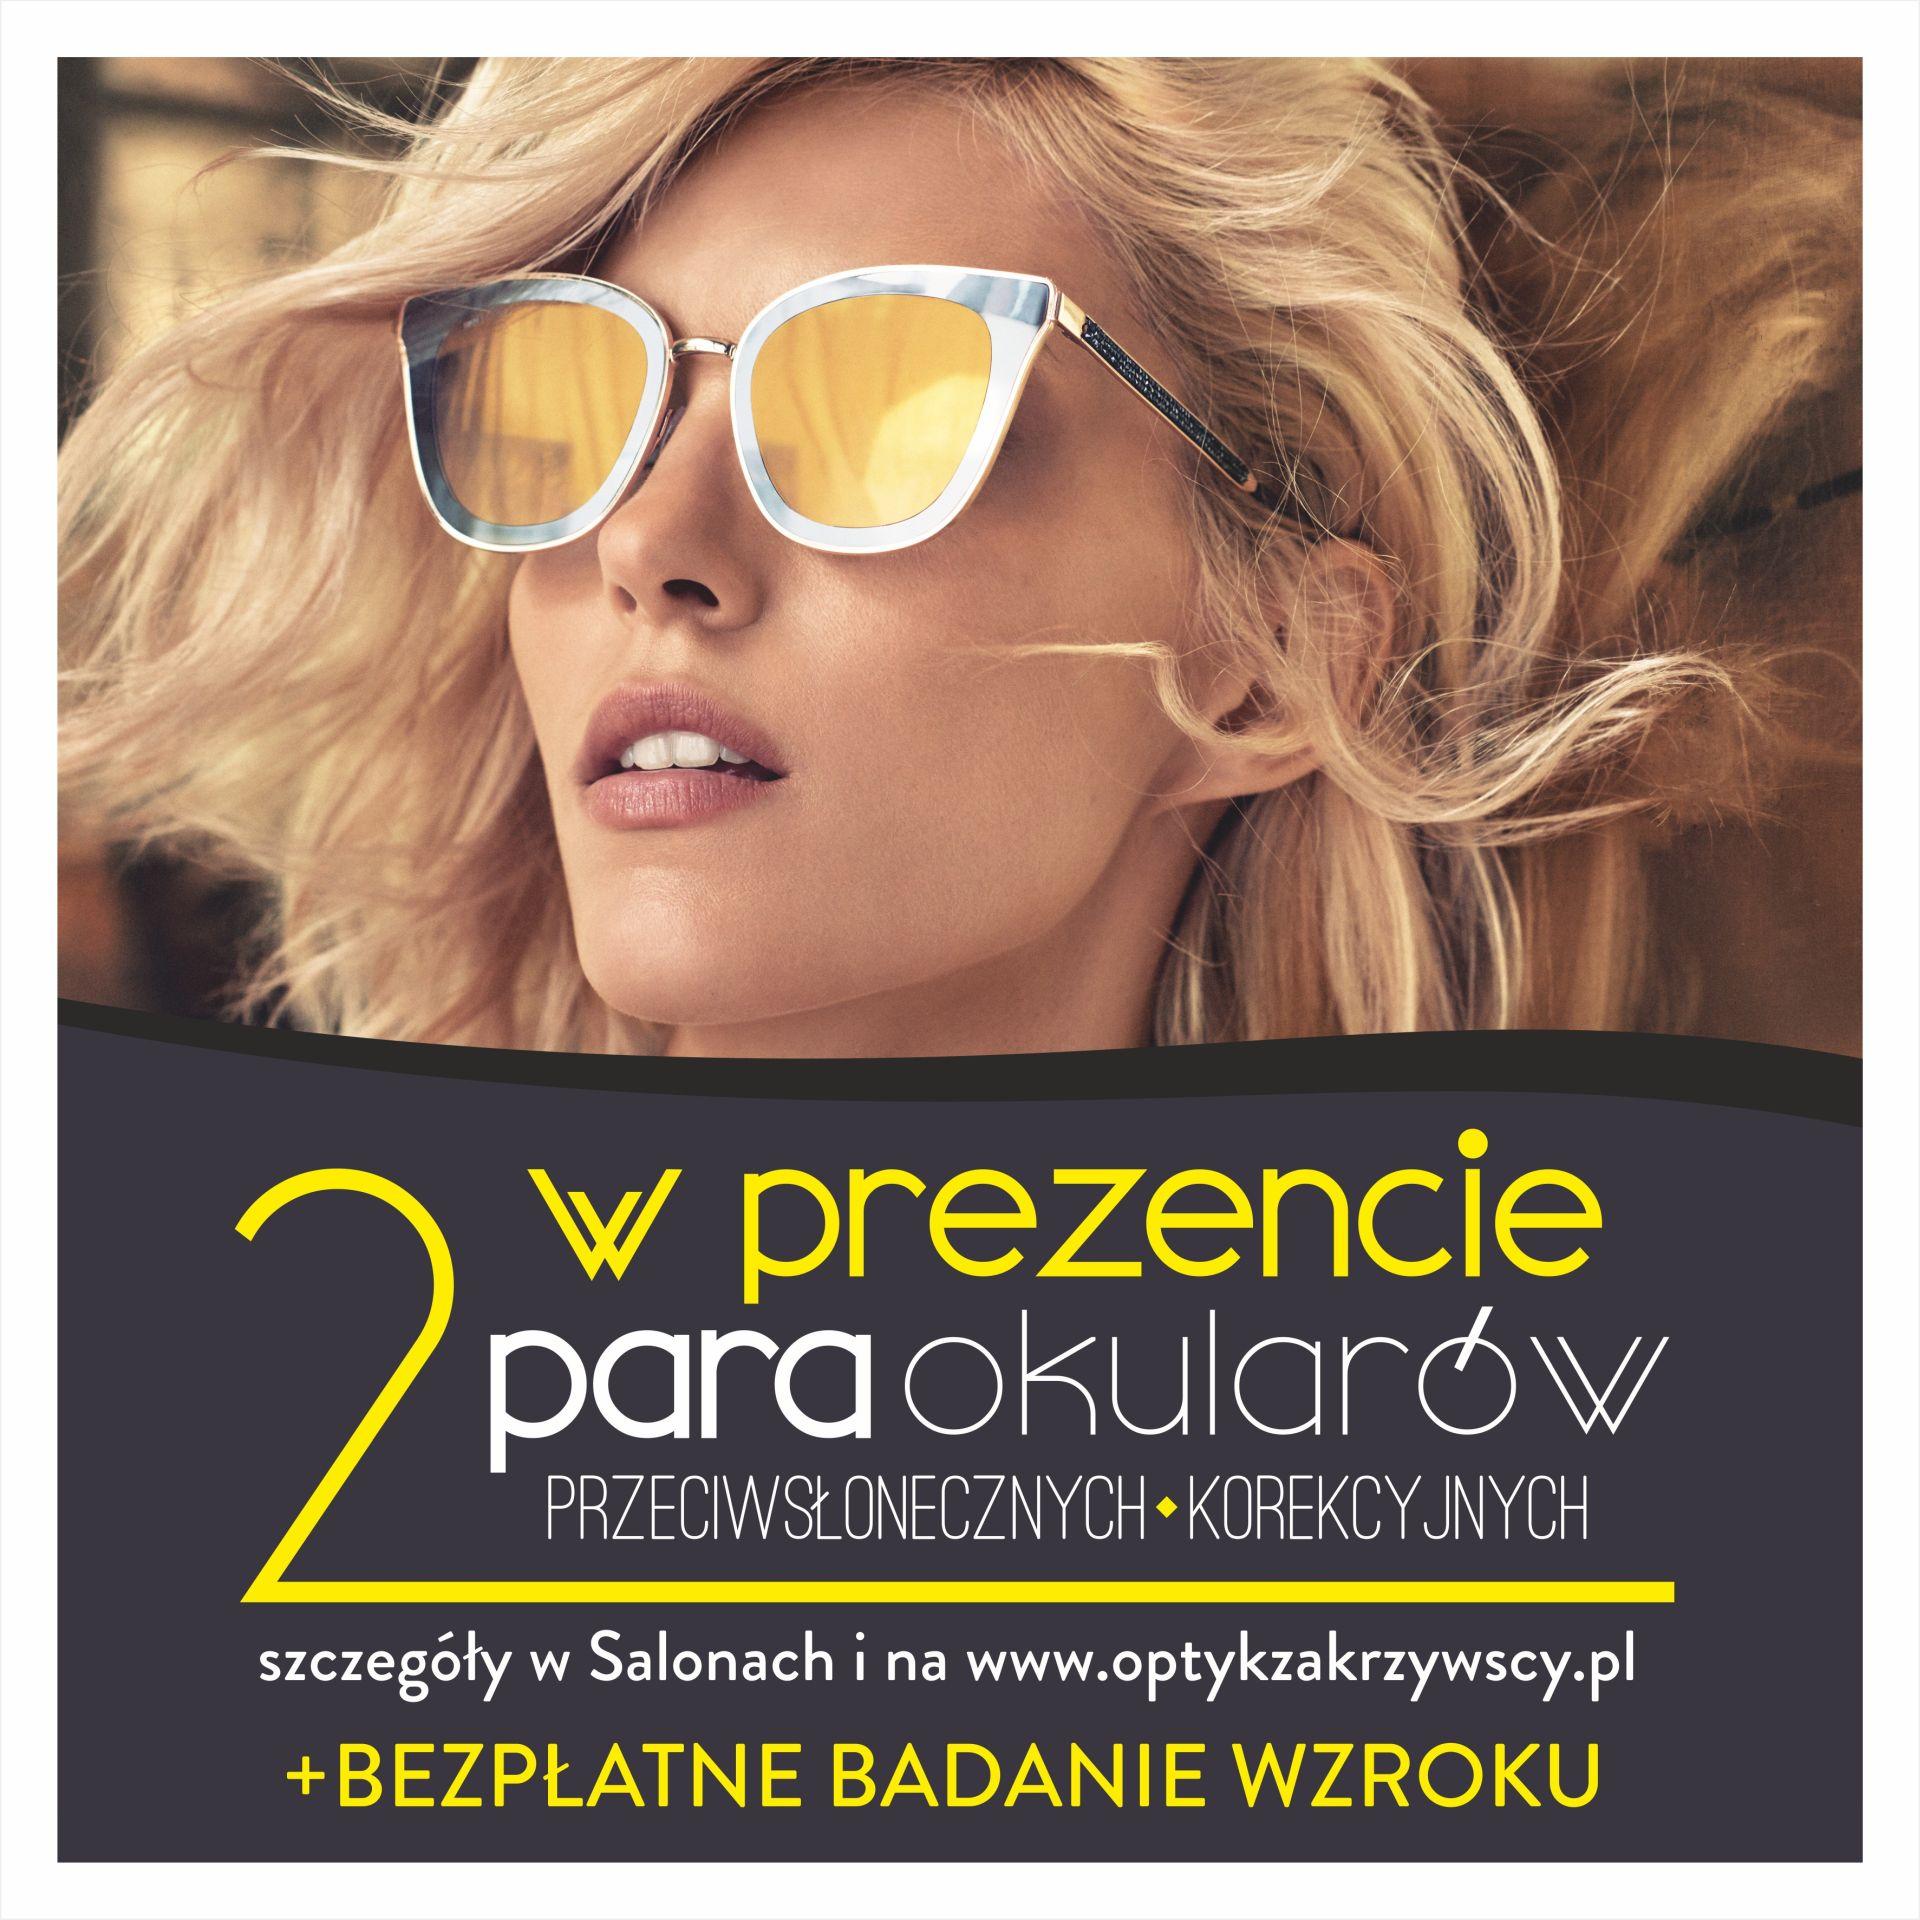 Promocja - 2 para okularów gratis